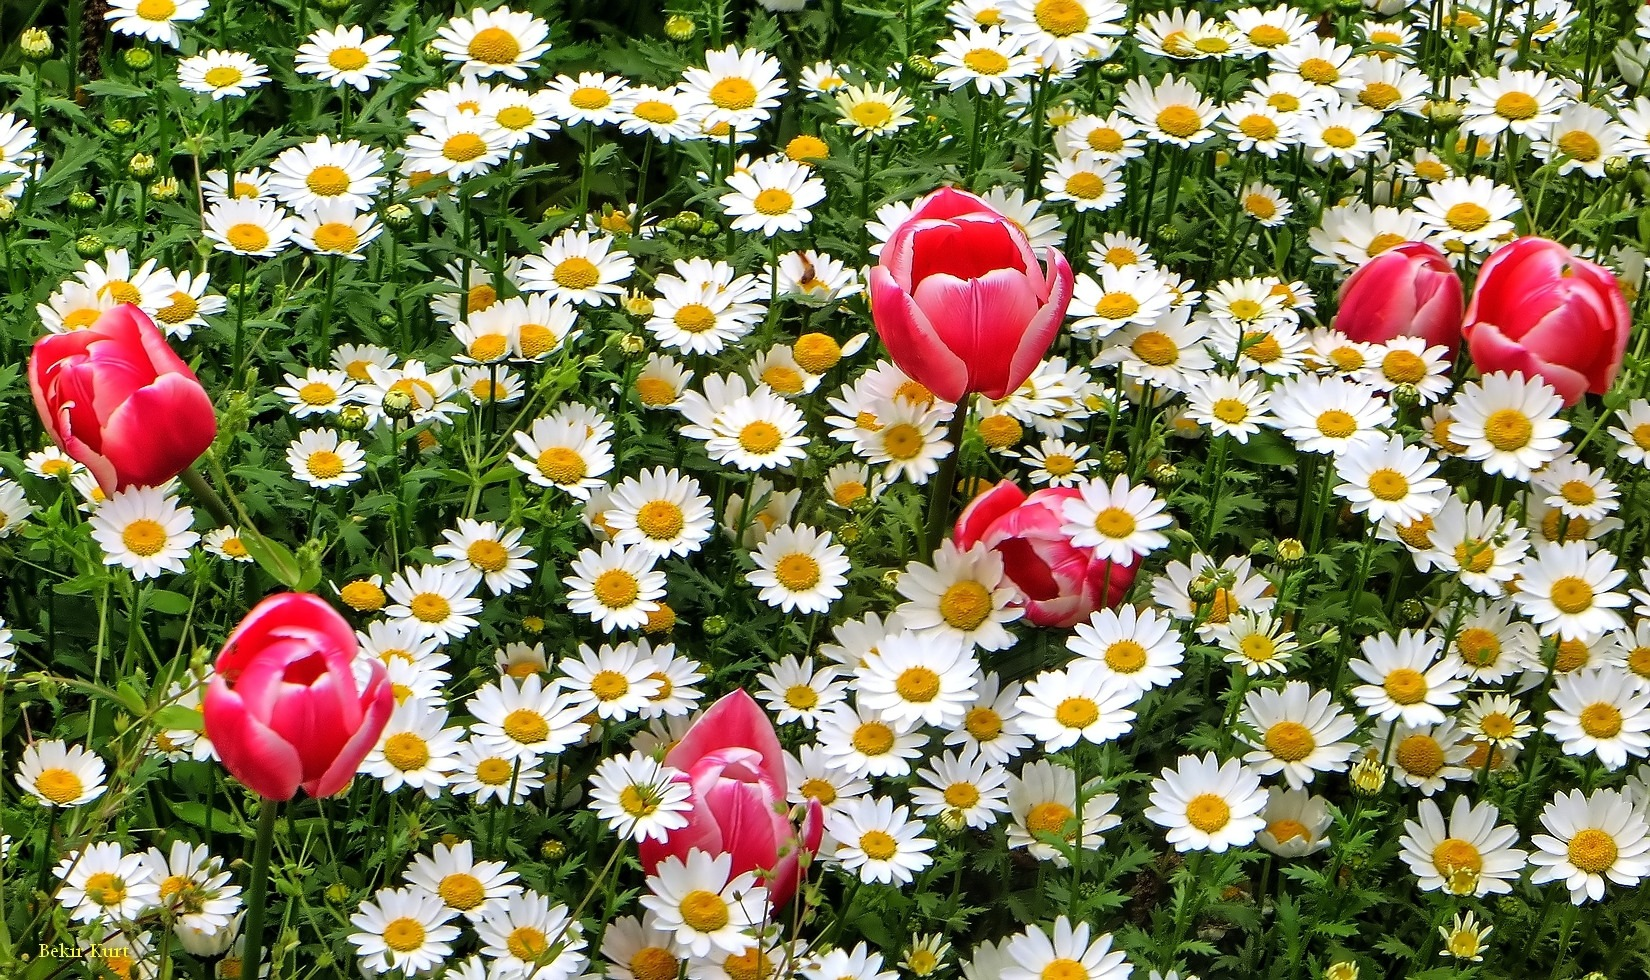 Daisy & Tulip by Bekir Kurt